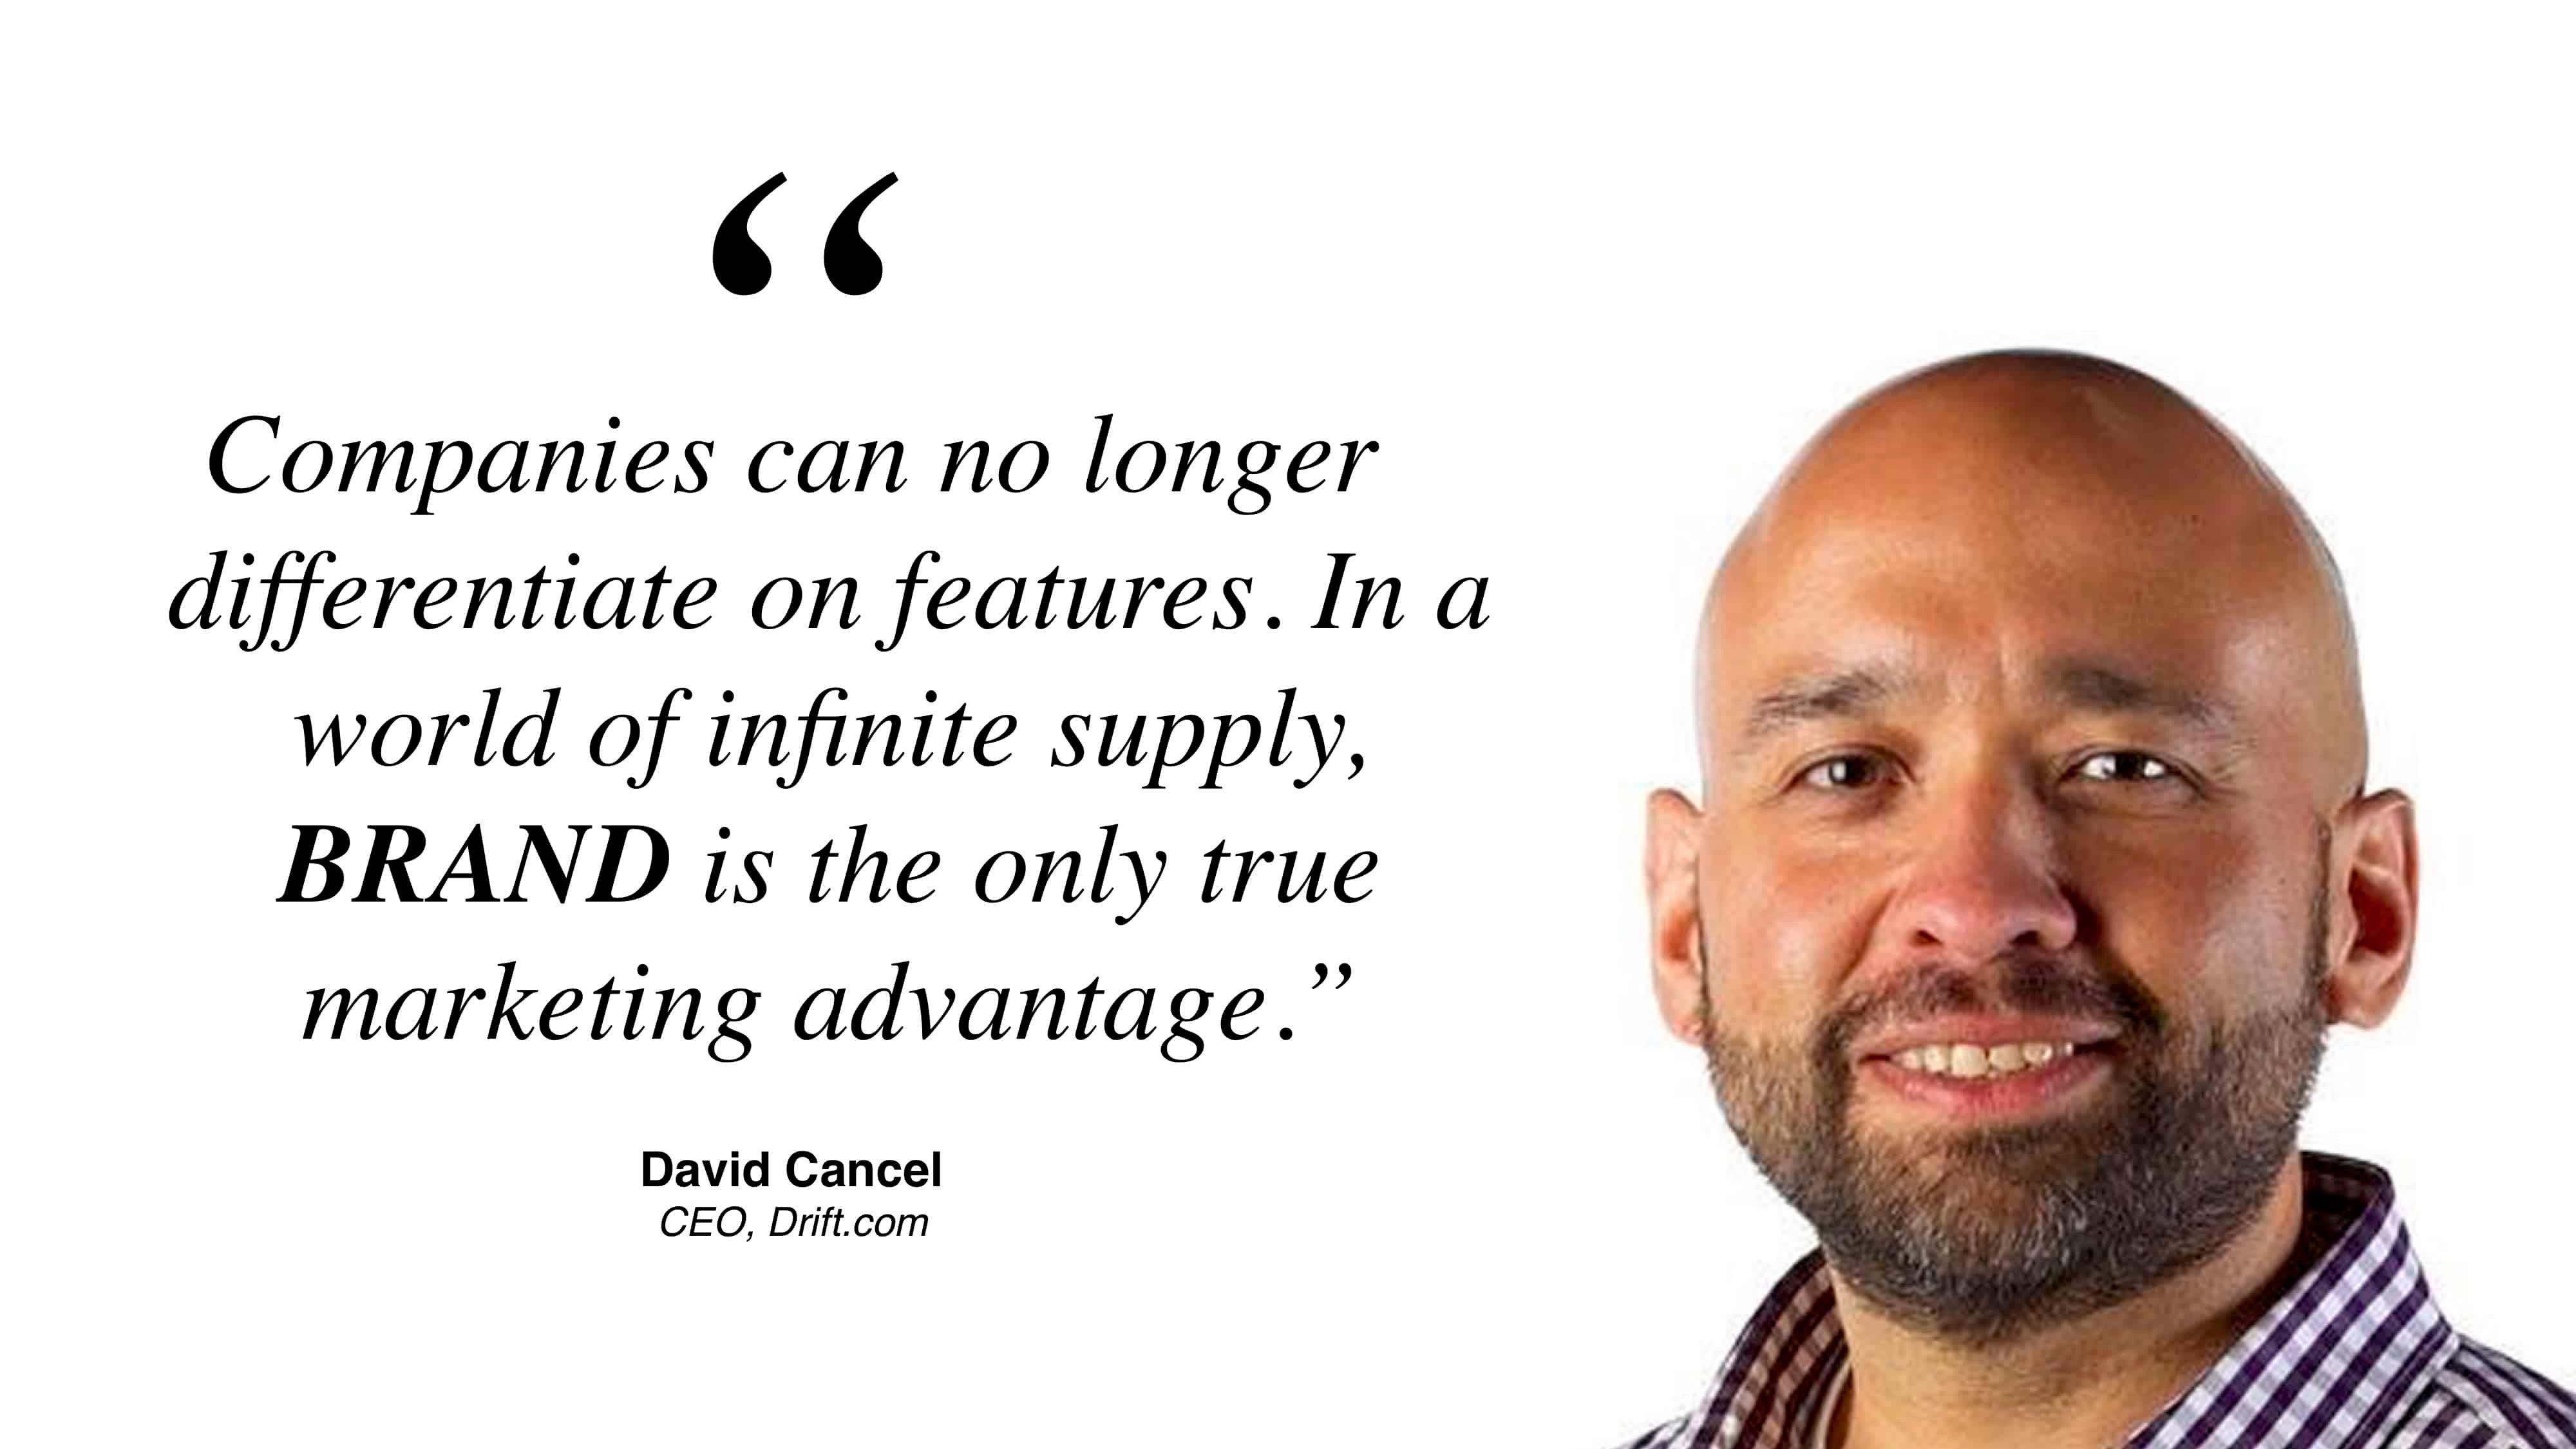 David Cancel on Brand